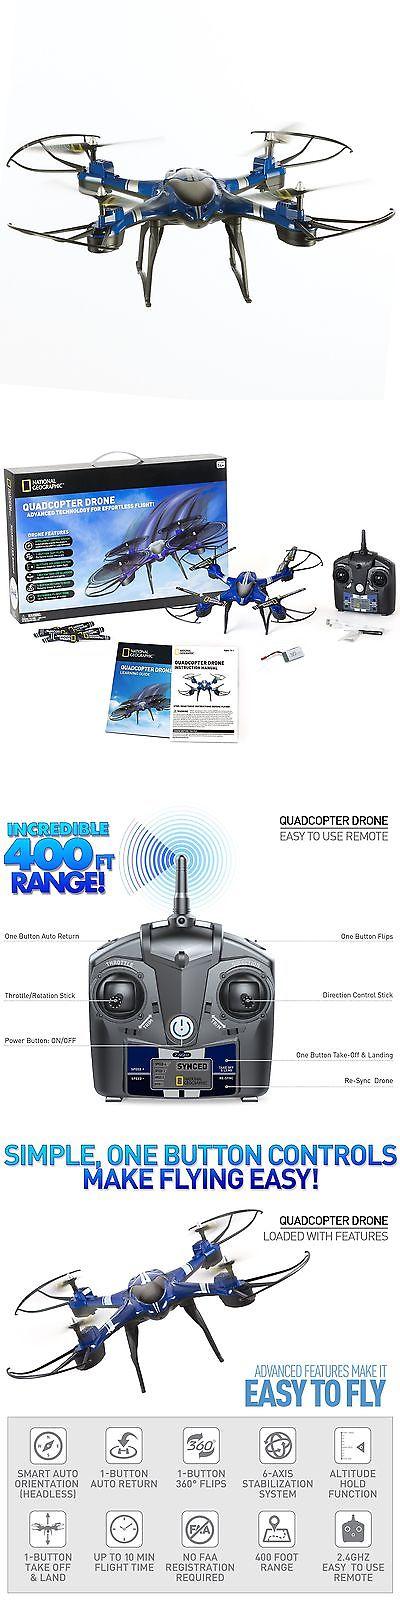 test qanba drone